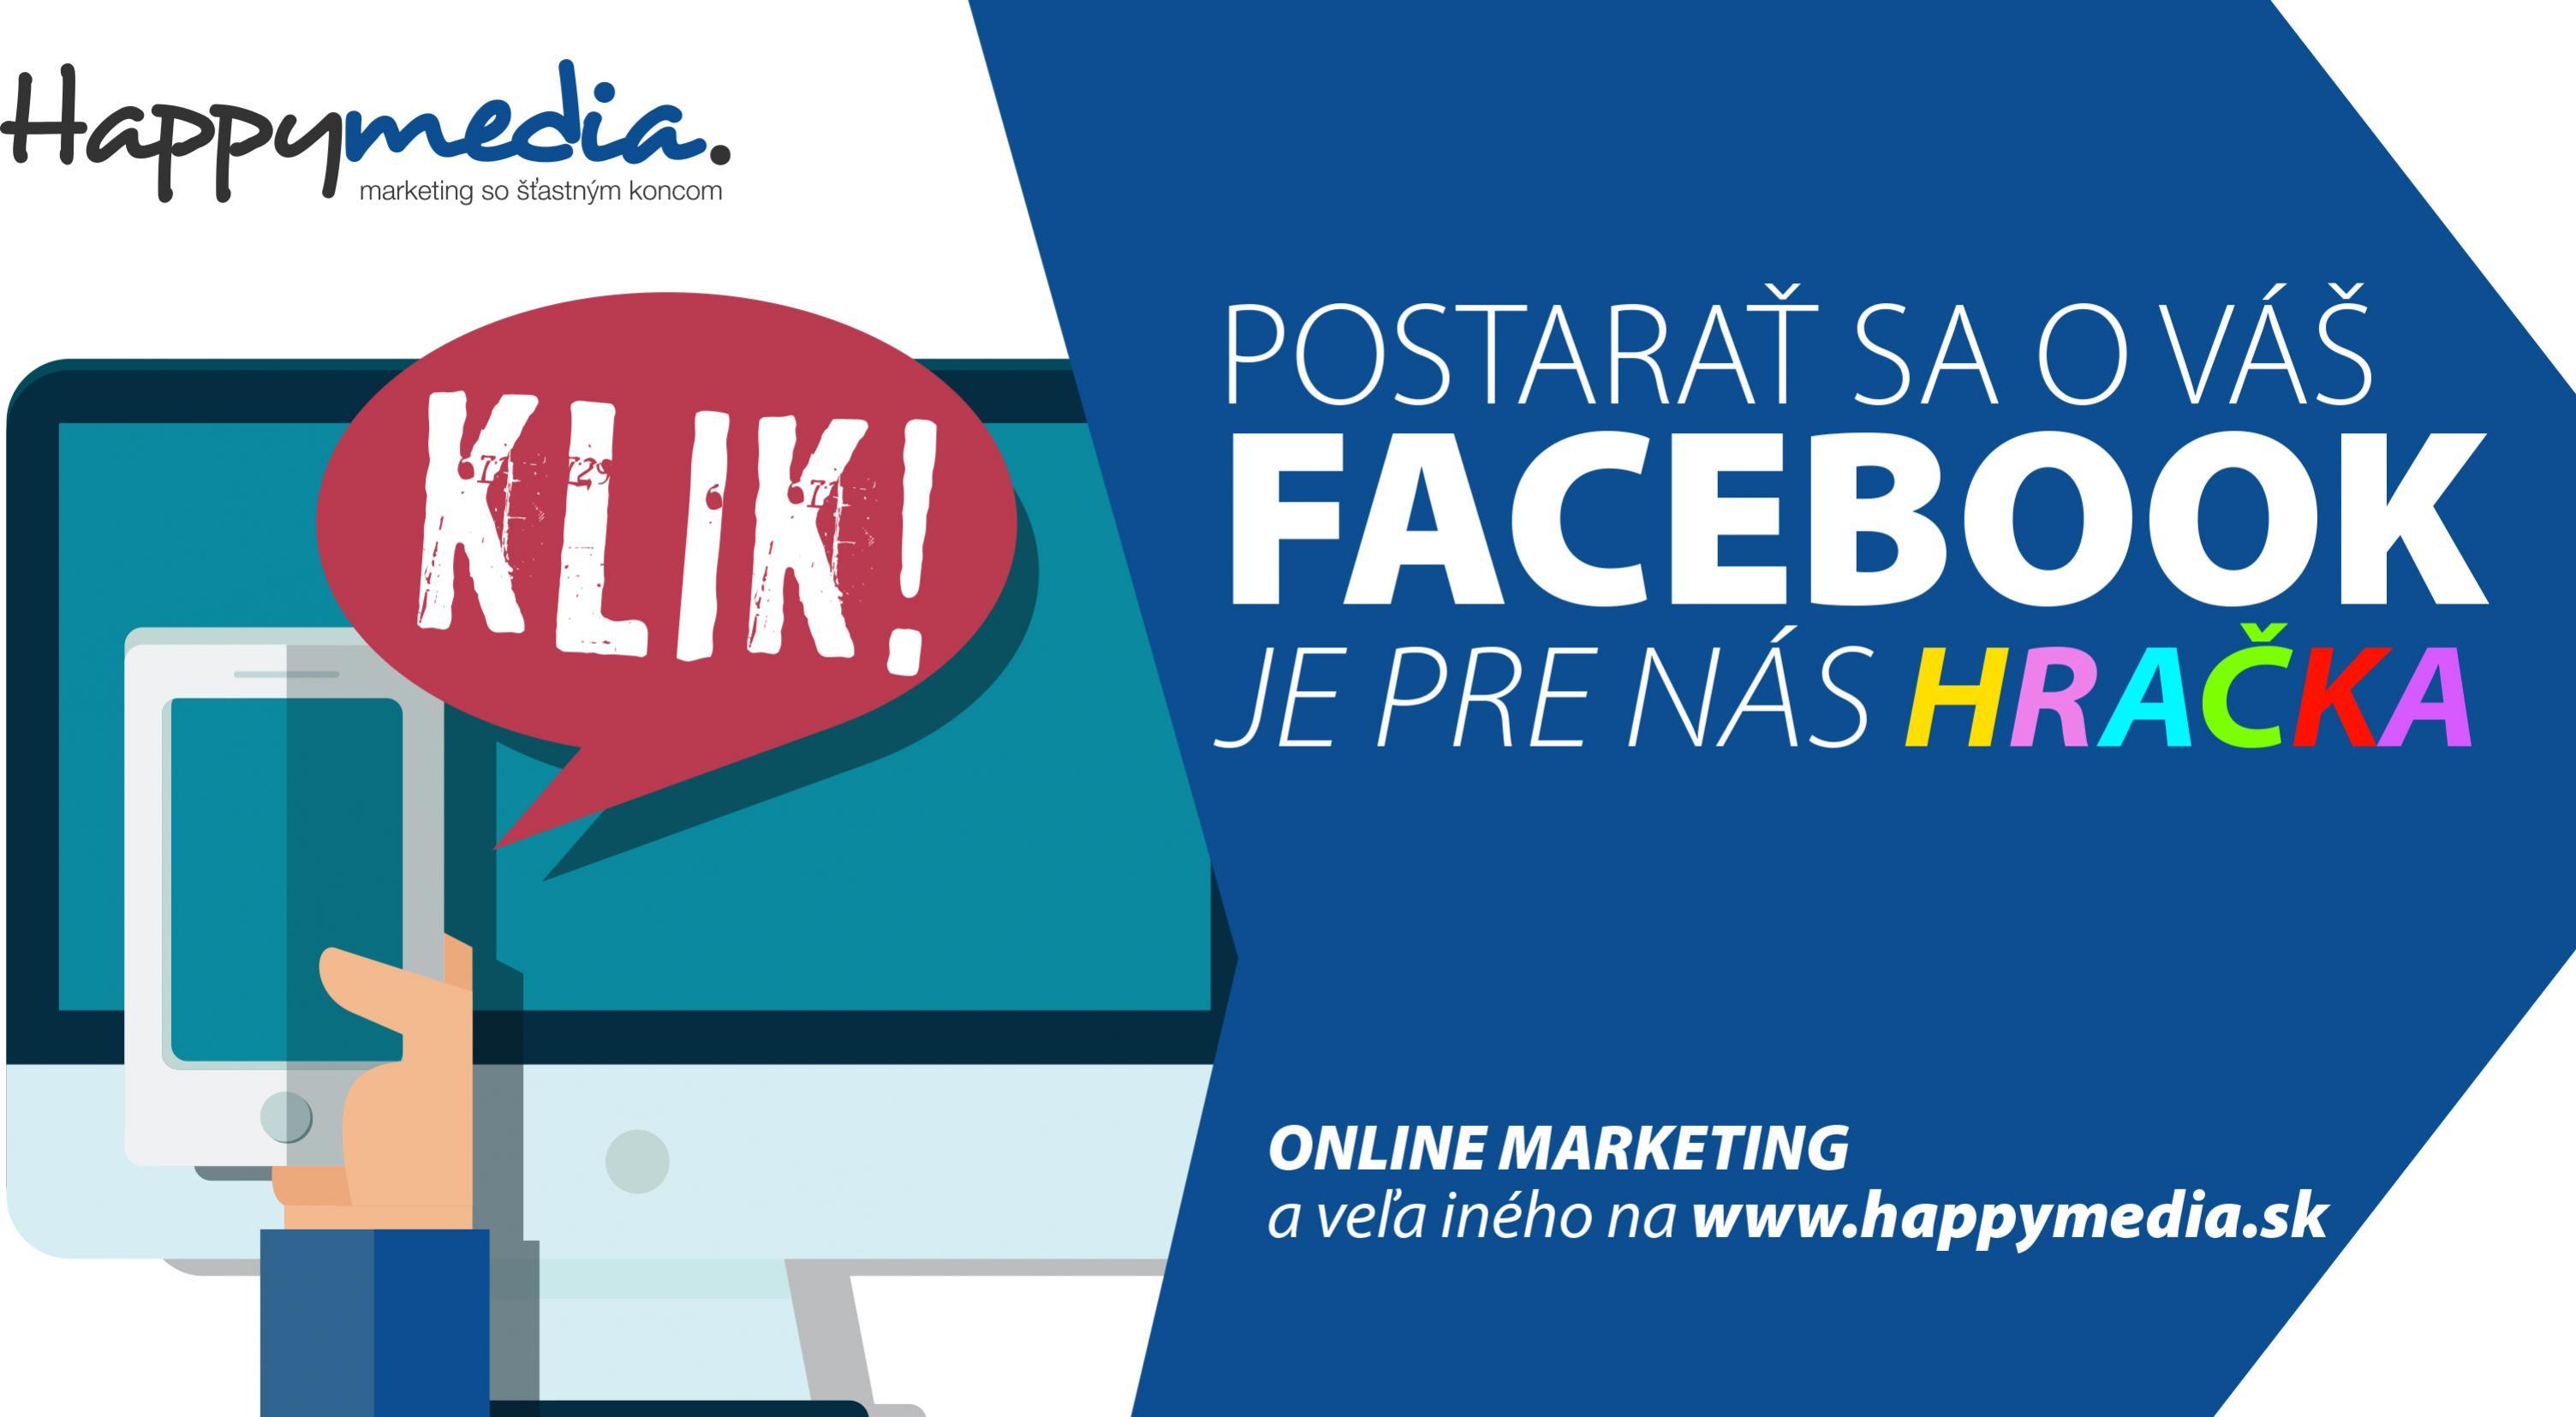 a61e1ed04cd0 Happymedia - marketing s happyendom - Služby a rôzne